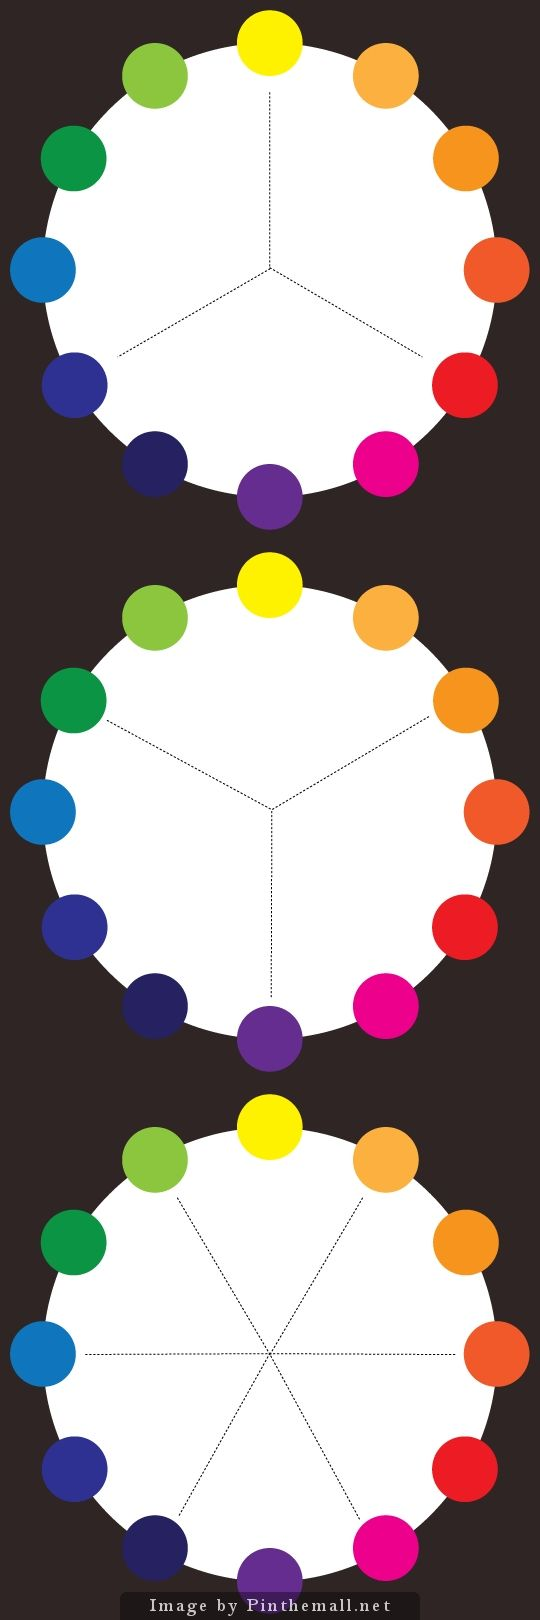 best 25 primary color wheel ideas on pinterest secondary color wheel colour wheel and colour. Black Bedroom Furniture Sets. Home Design Ideas